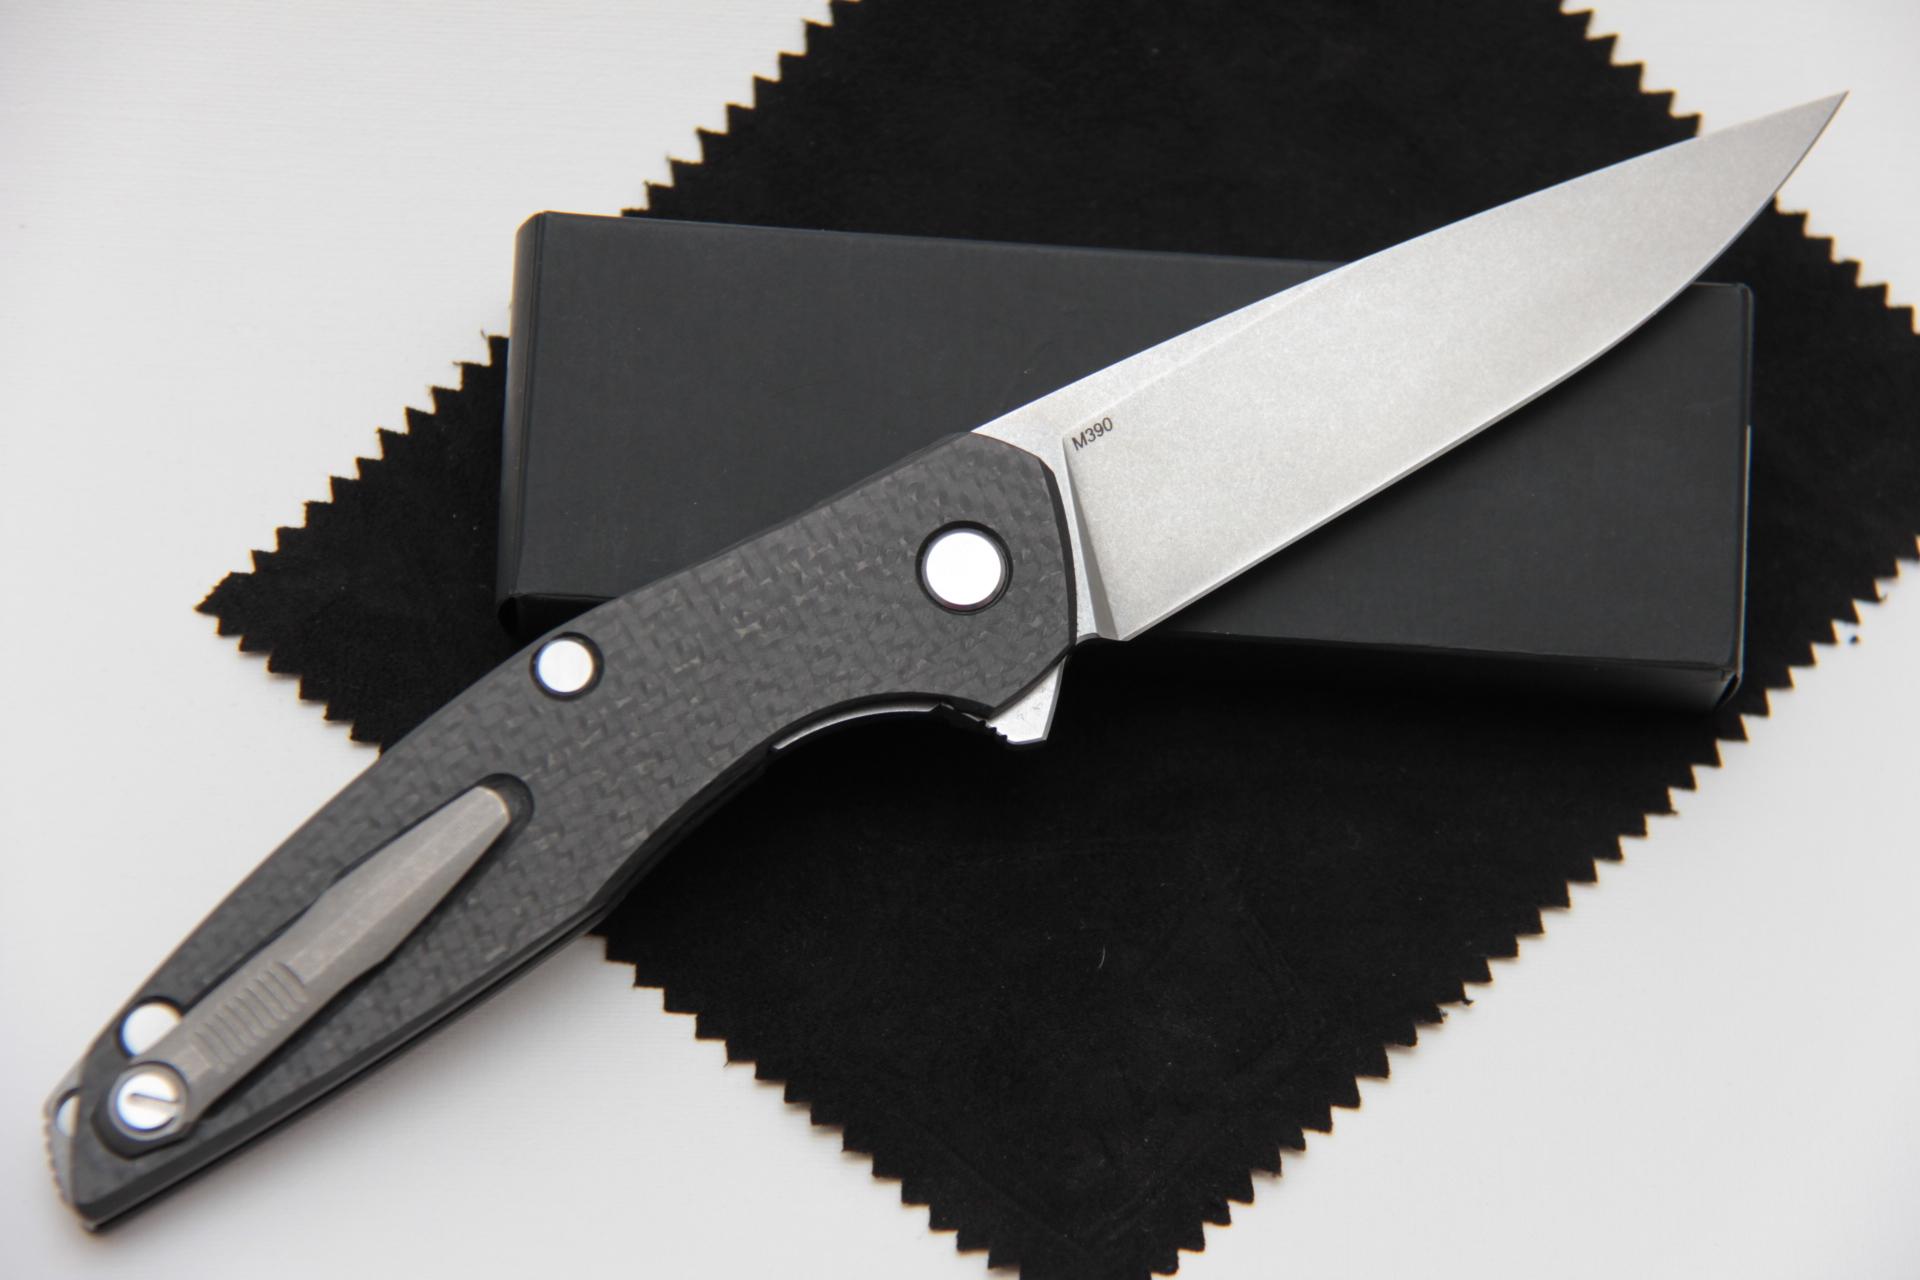 Нож Широгоров 111 карбоновая рукоять М390